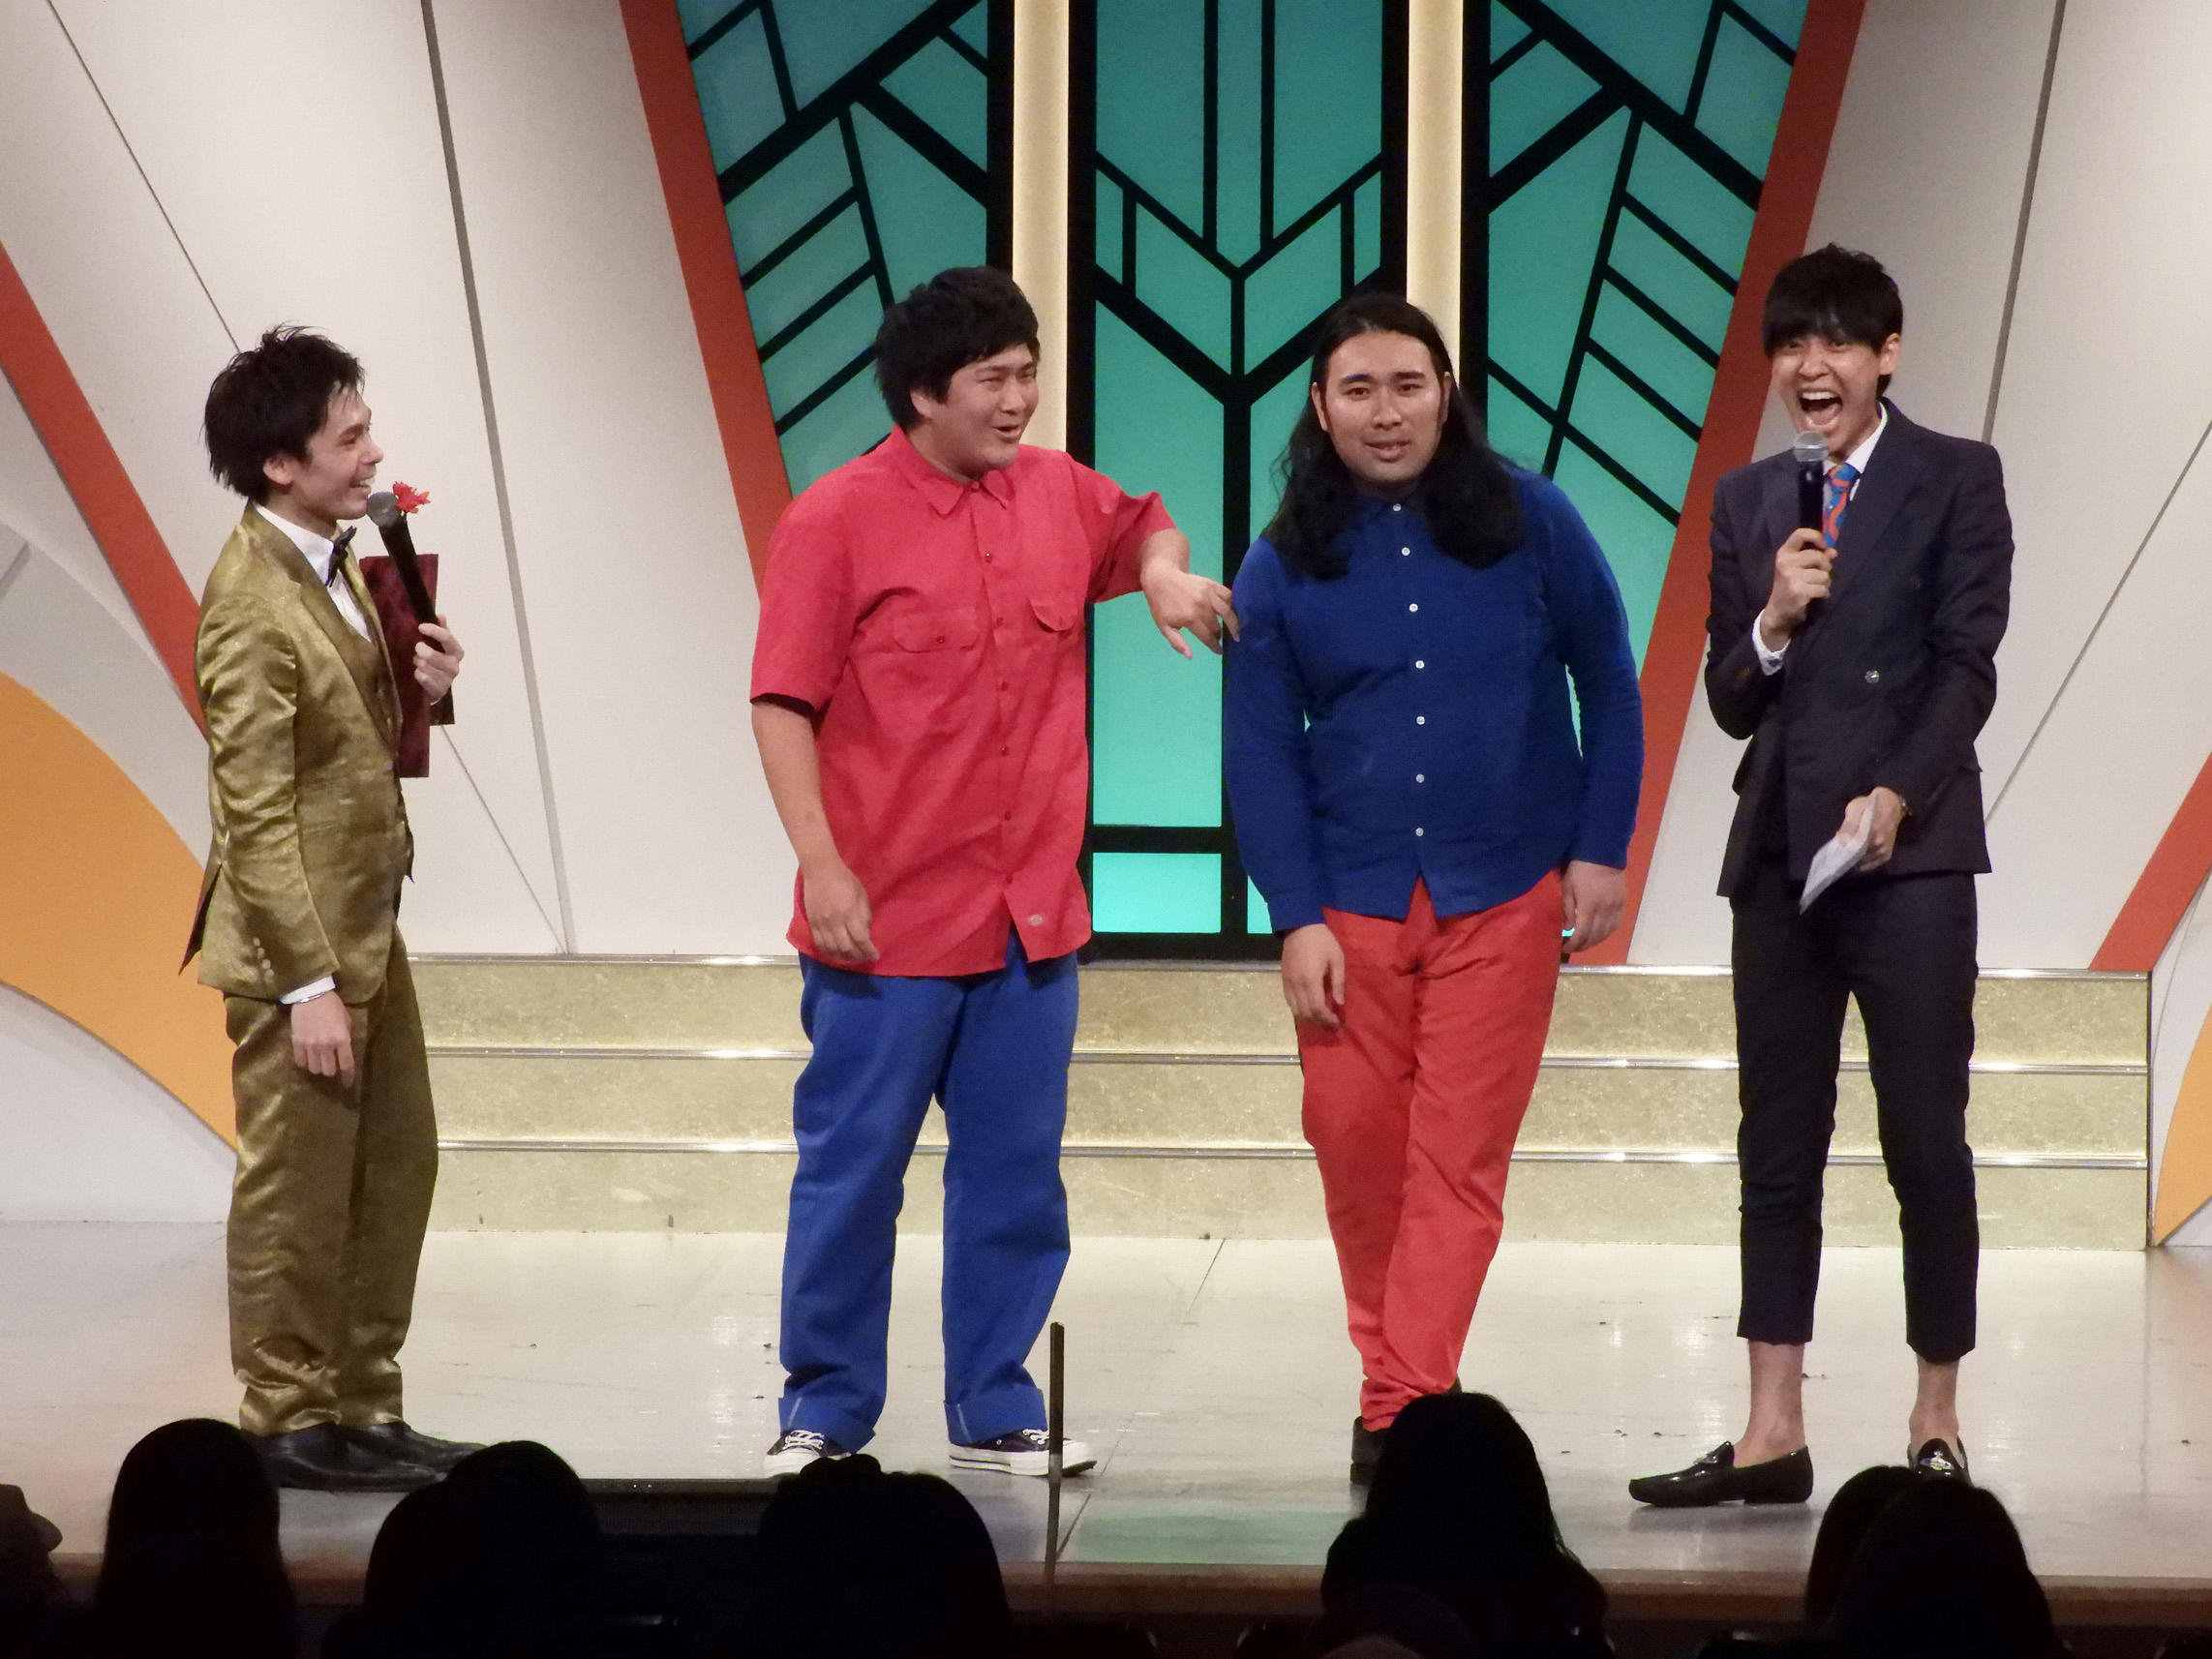 http://news.yoshimoto.co.jp/20180914111524-15c0787b844ce871901404624a1453a093d46c69.jpg